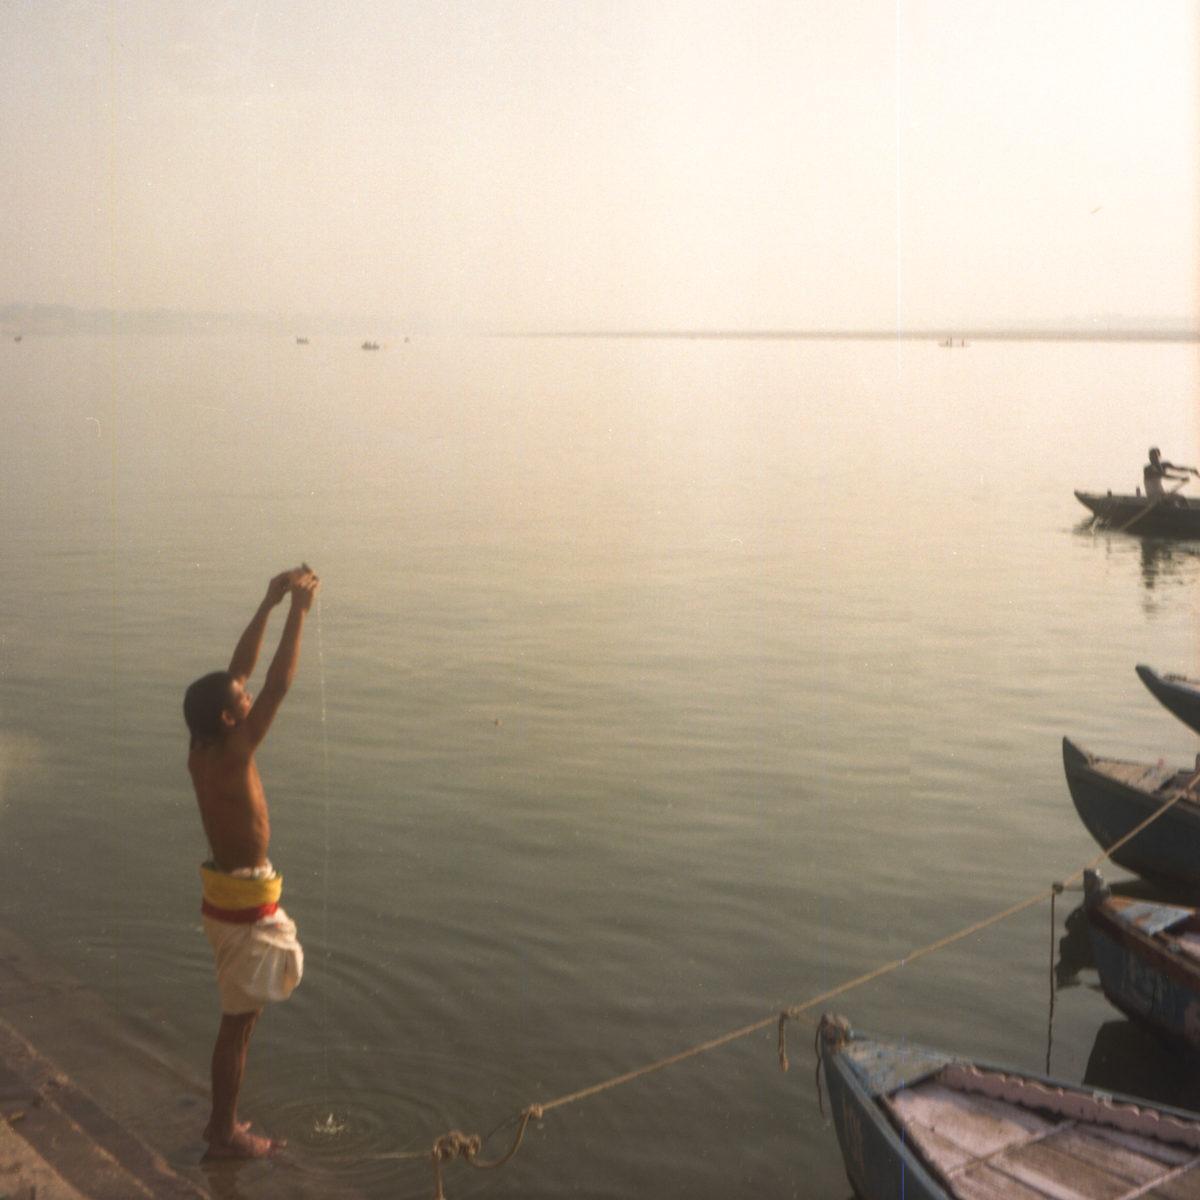 Pray, Varanasi, India 2015